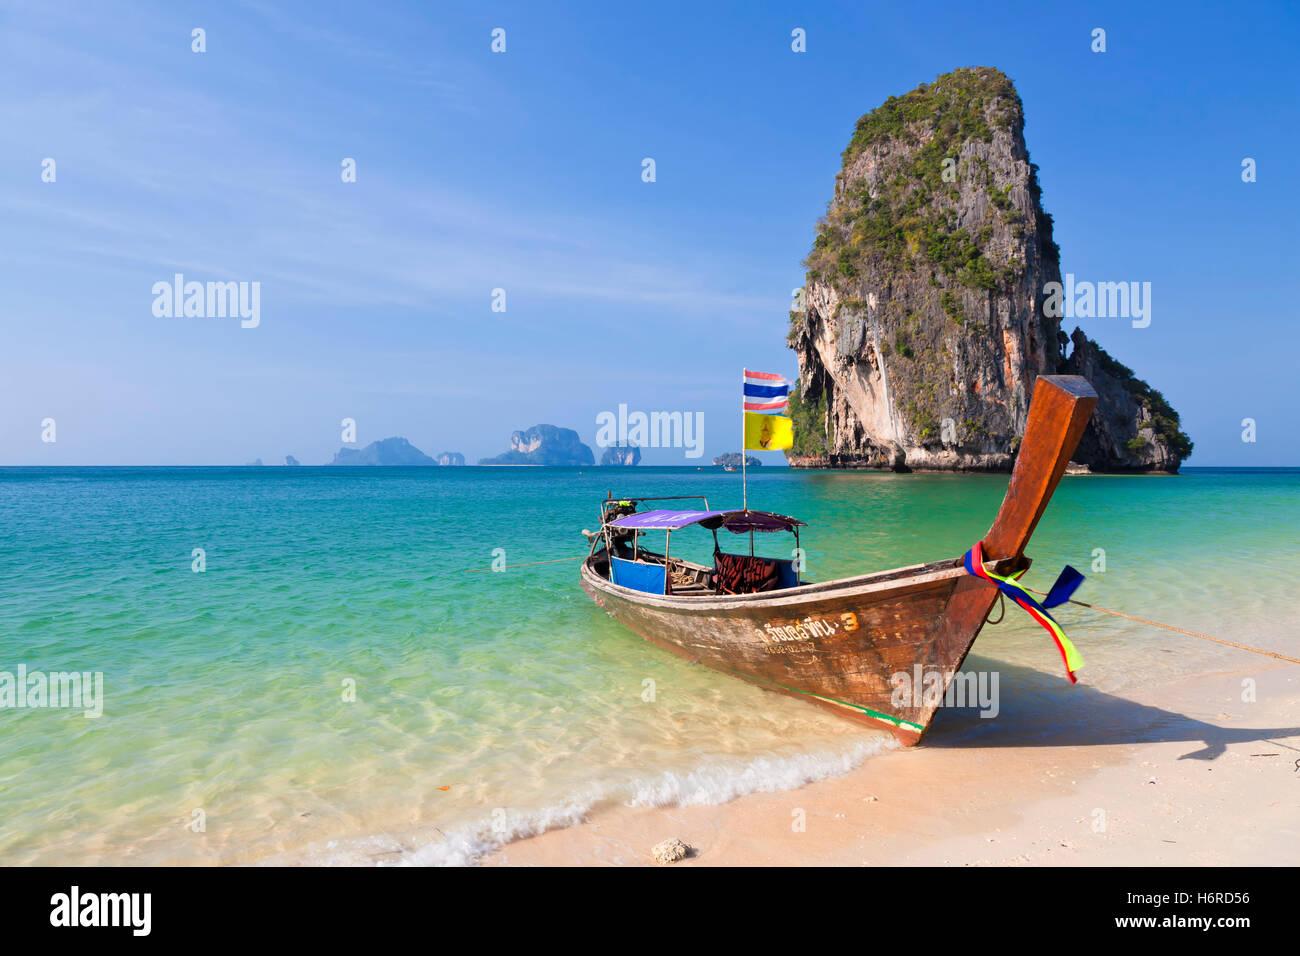 railey beach in thailand - Stock Image